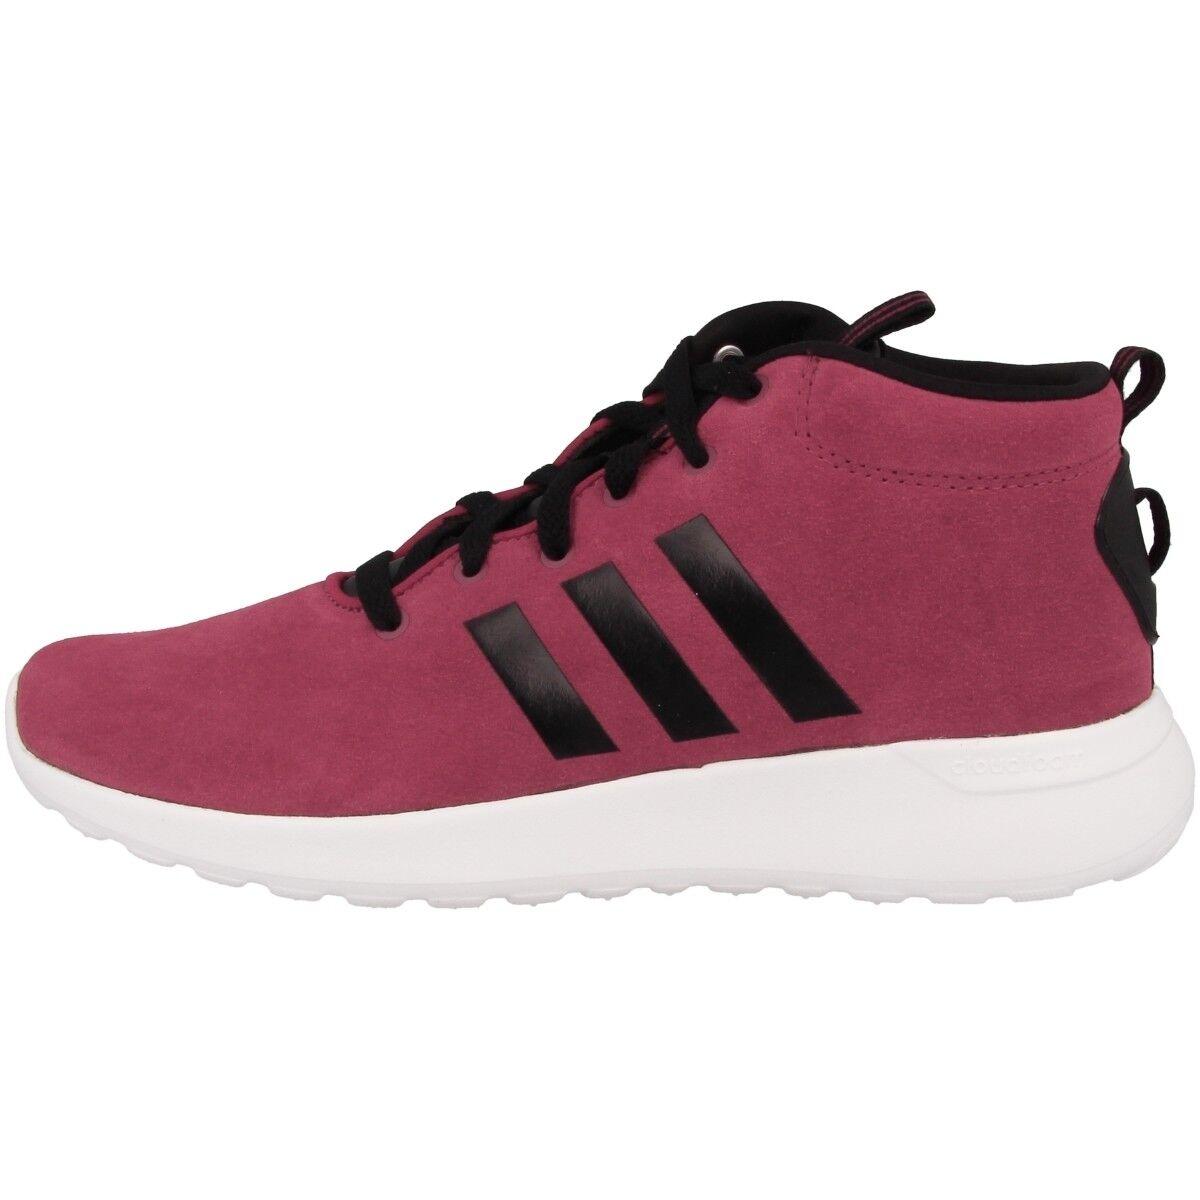 Adidas NEO CF Lite Racer Mid Cut Sneaker Freizeit Schuhe burgundy black CG5705